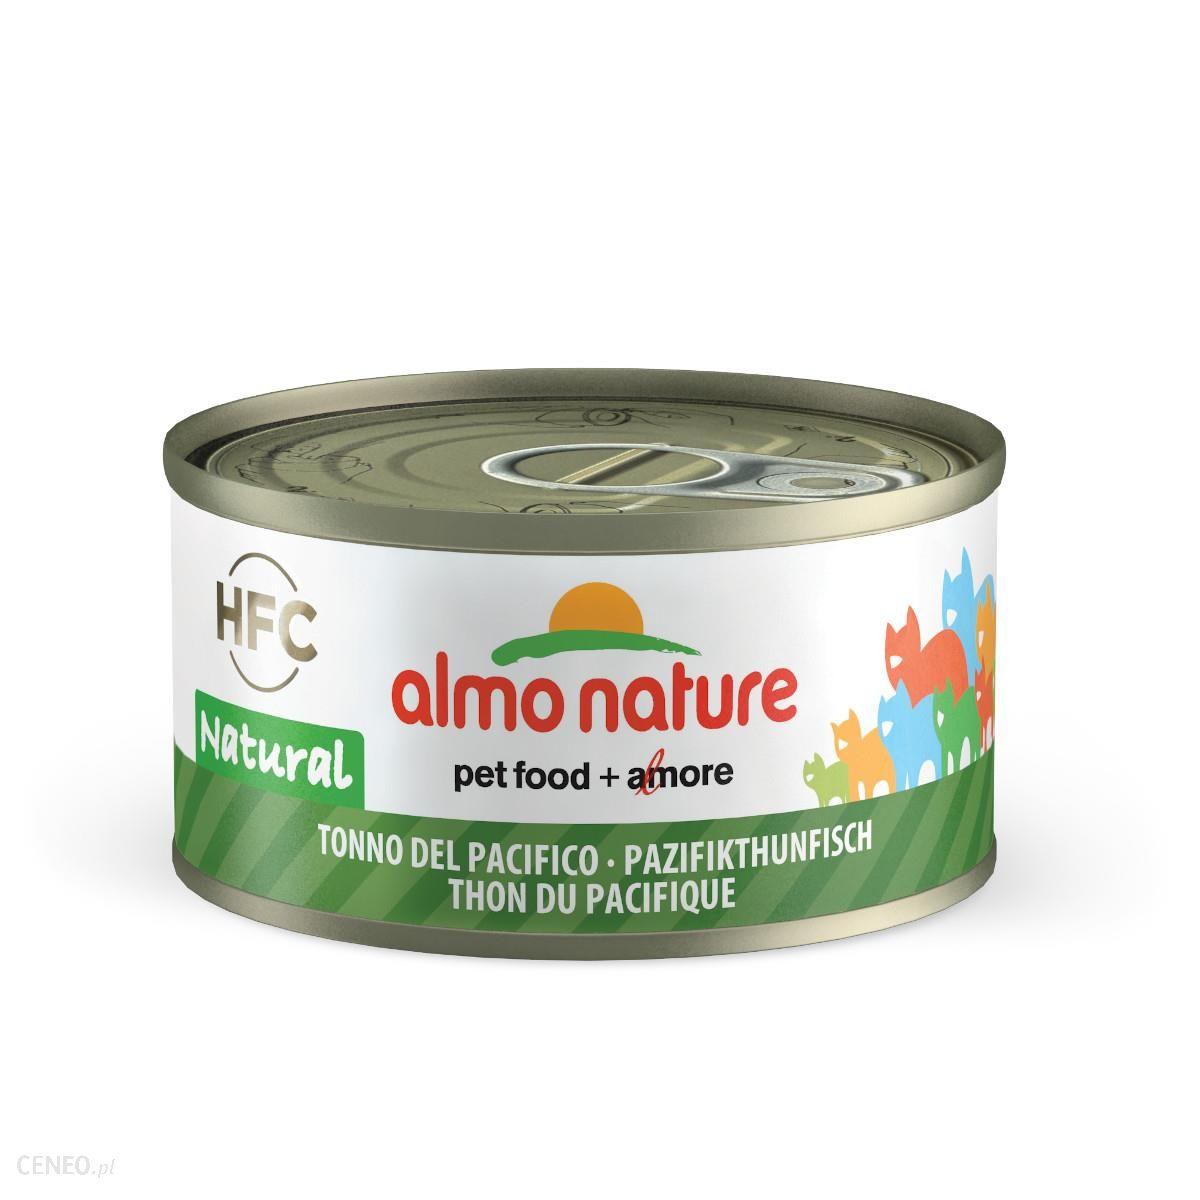 Almo Nature Puszka Hfc Natural Tuńczyk Pacyficzny 70G